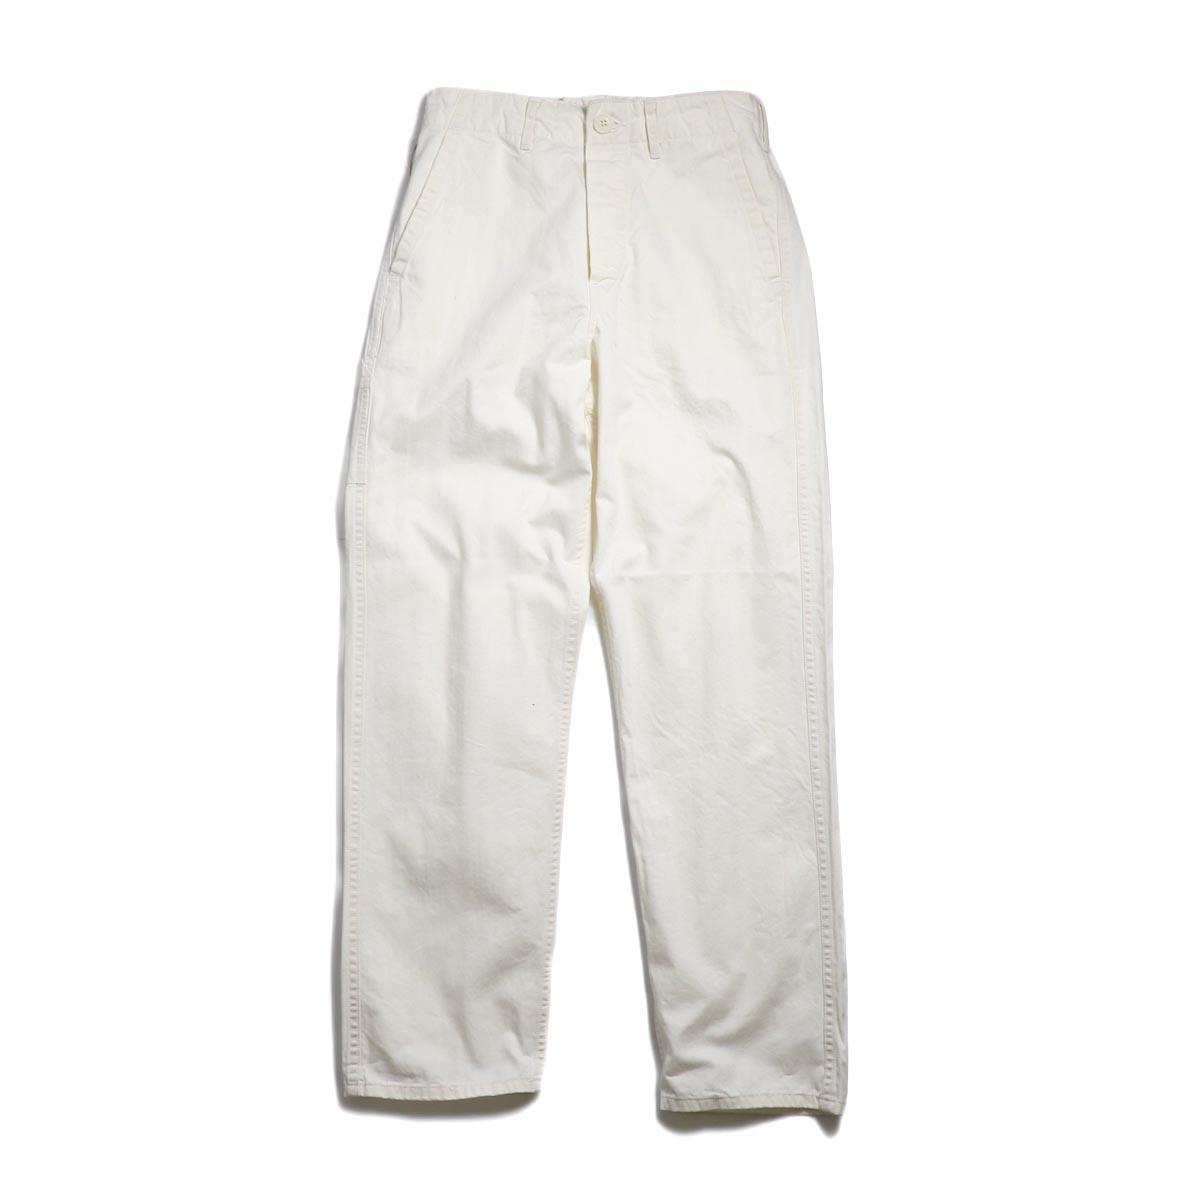 orSlow / French Work Pants -Ecru